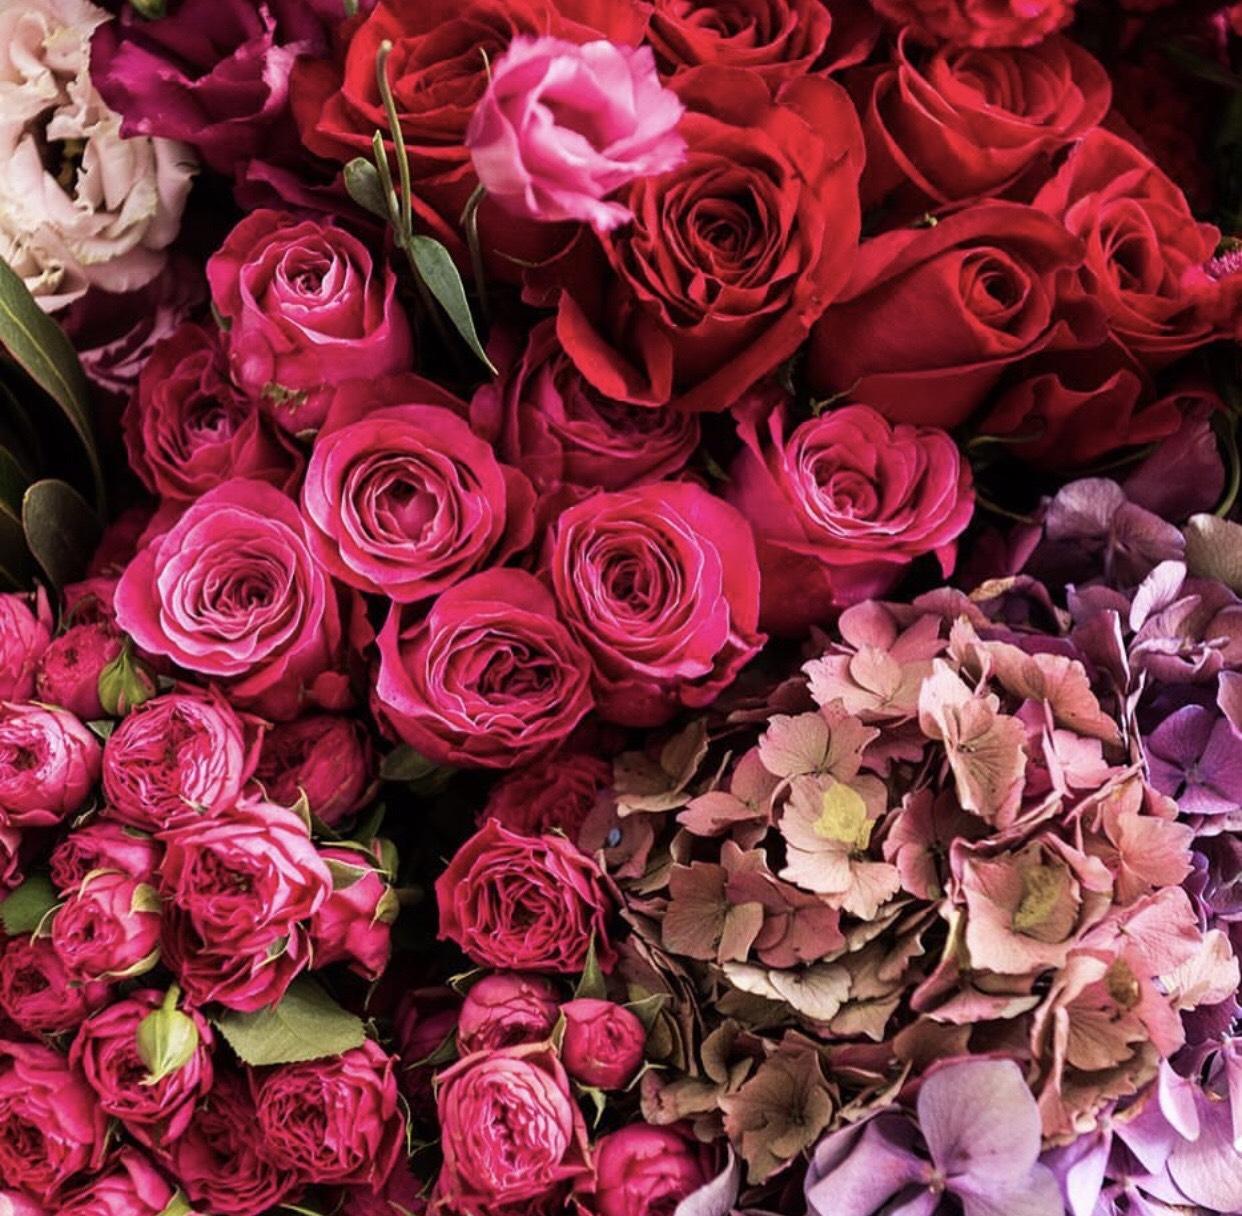 Lady Brisbane Northside Flower Market